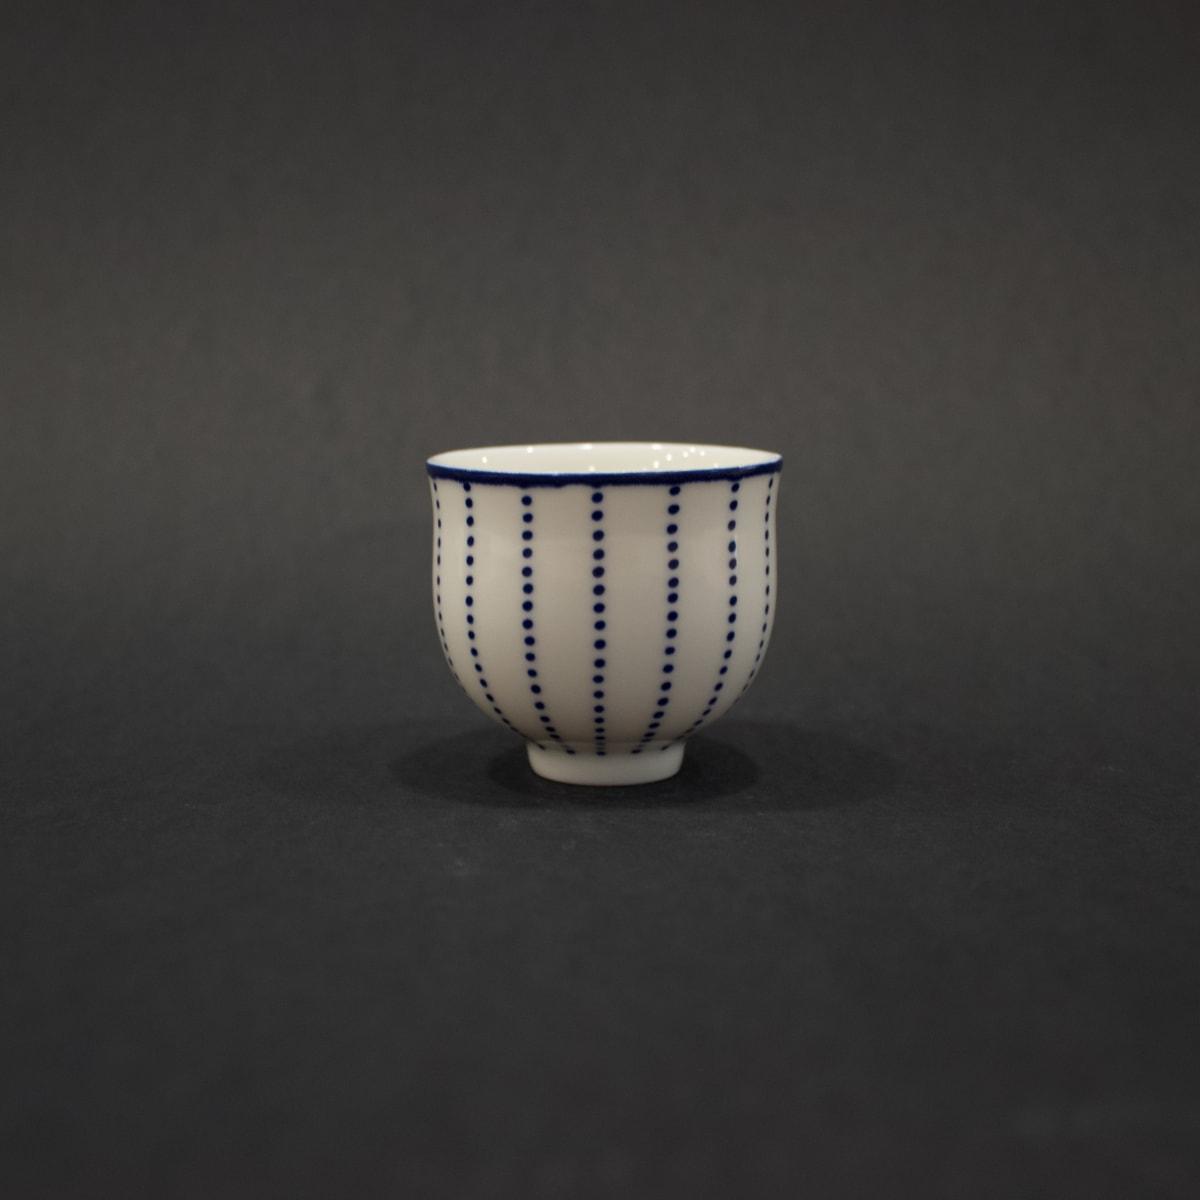 Rhian Malin Dotty Cup, 2019 Porcelain 5.5 x 6 x 6 cm 2 1/8 x 2 3/8 x 2 3/8 in